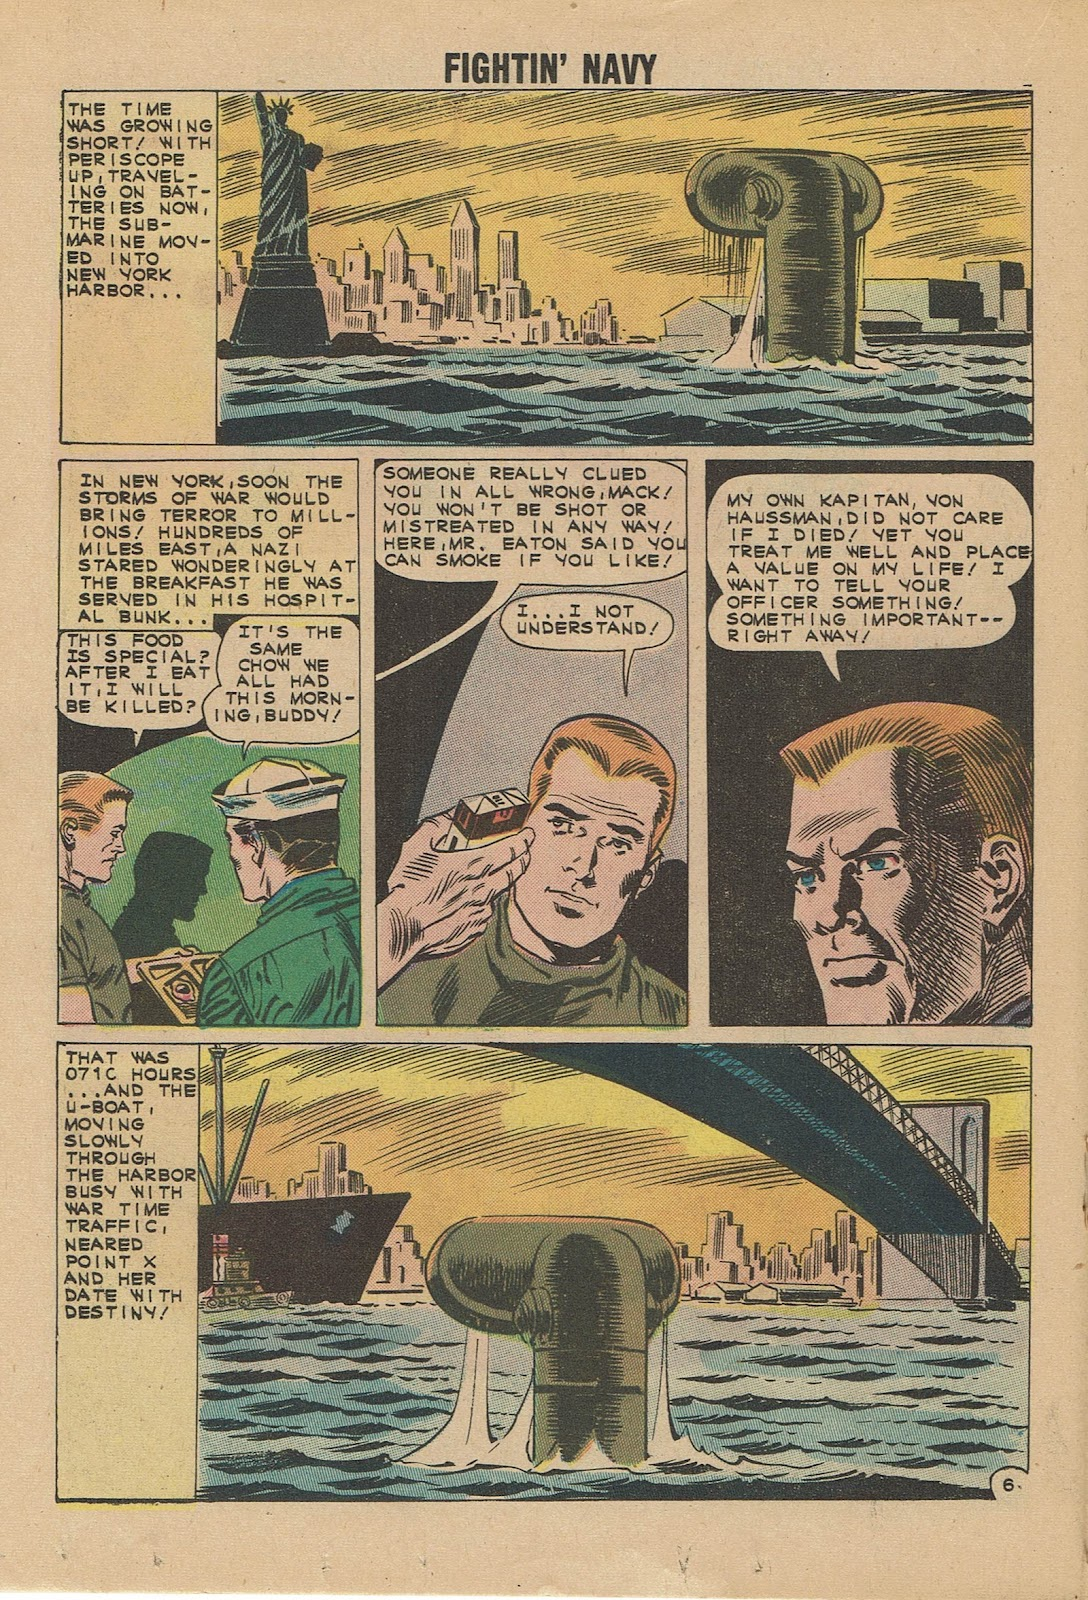 Read online Fightin' Navy comic -  Issue #101 - 18